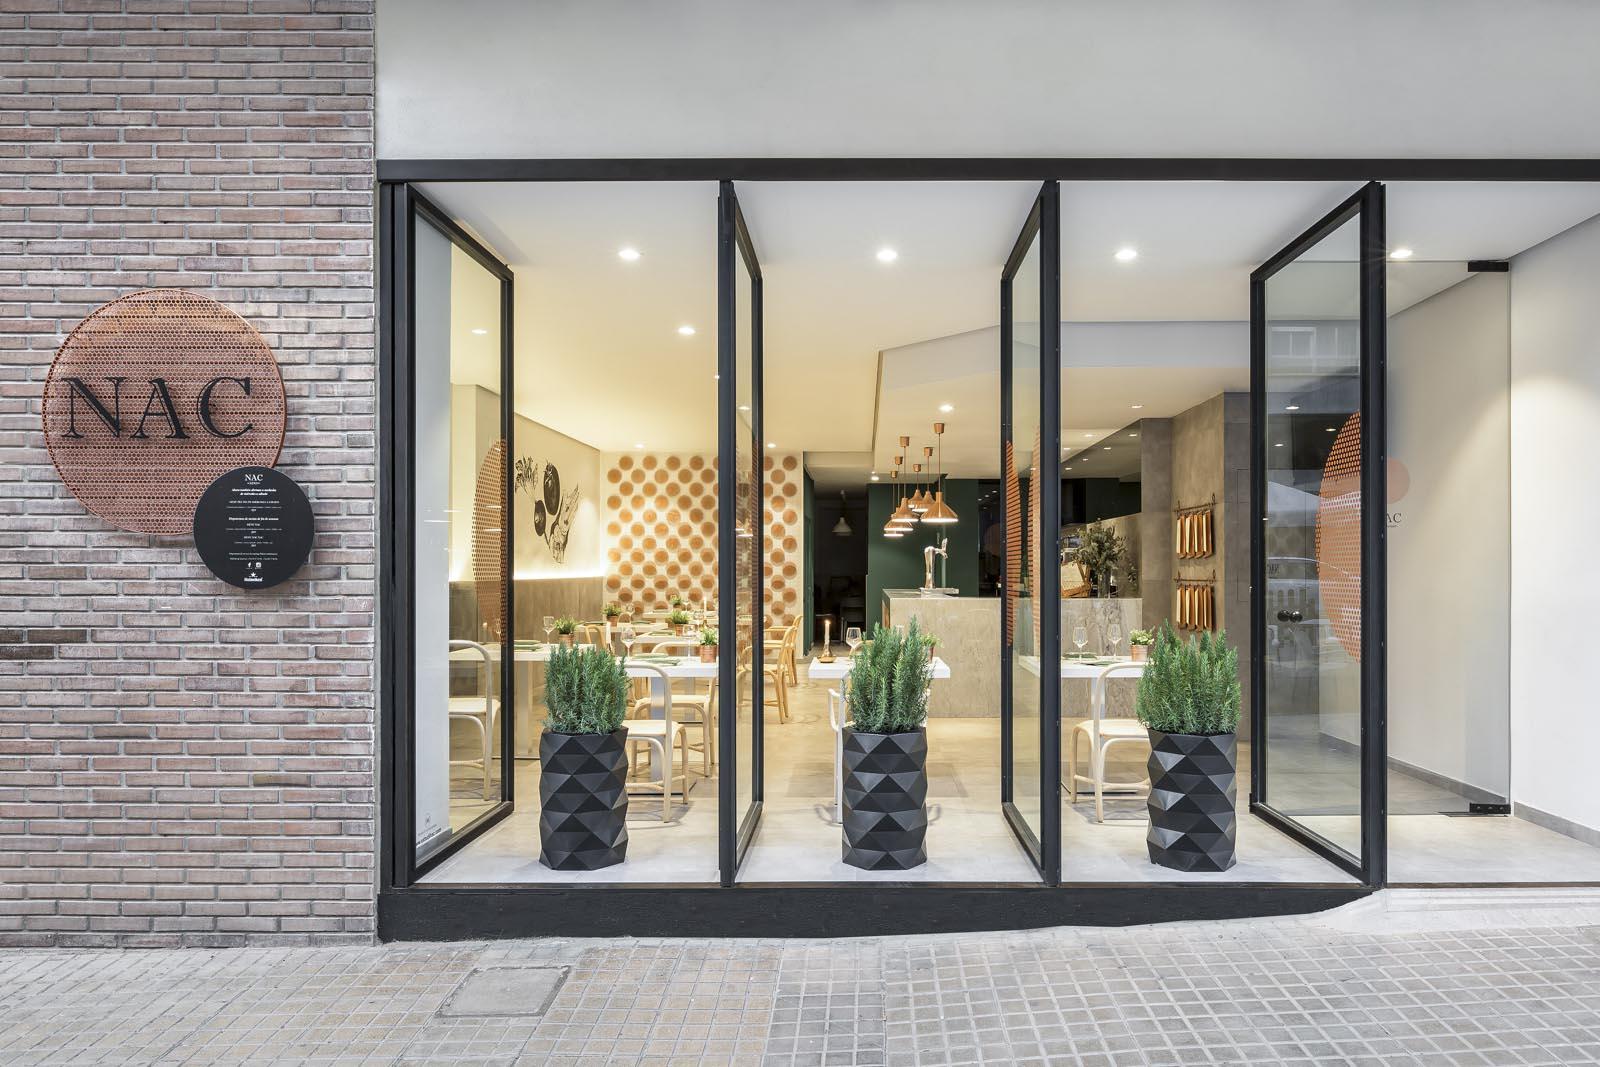 fotografia-arquitectura-valencia-german-cabo-estudihac-restaurante-nac-ontinyent-xx